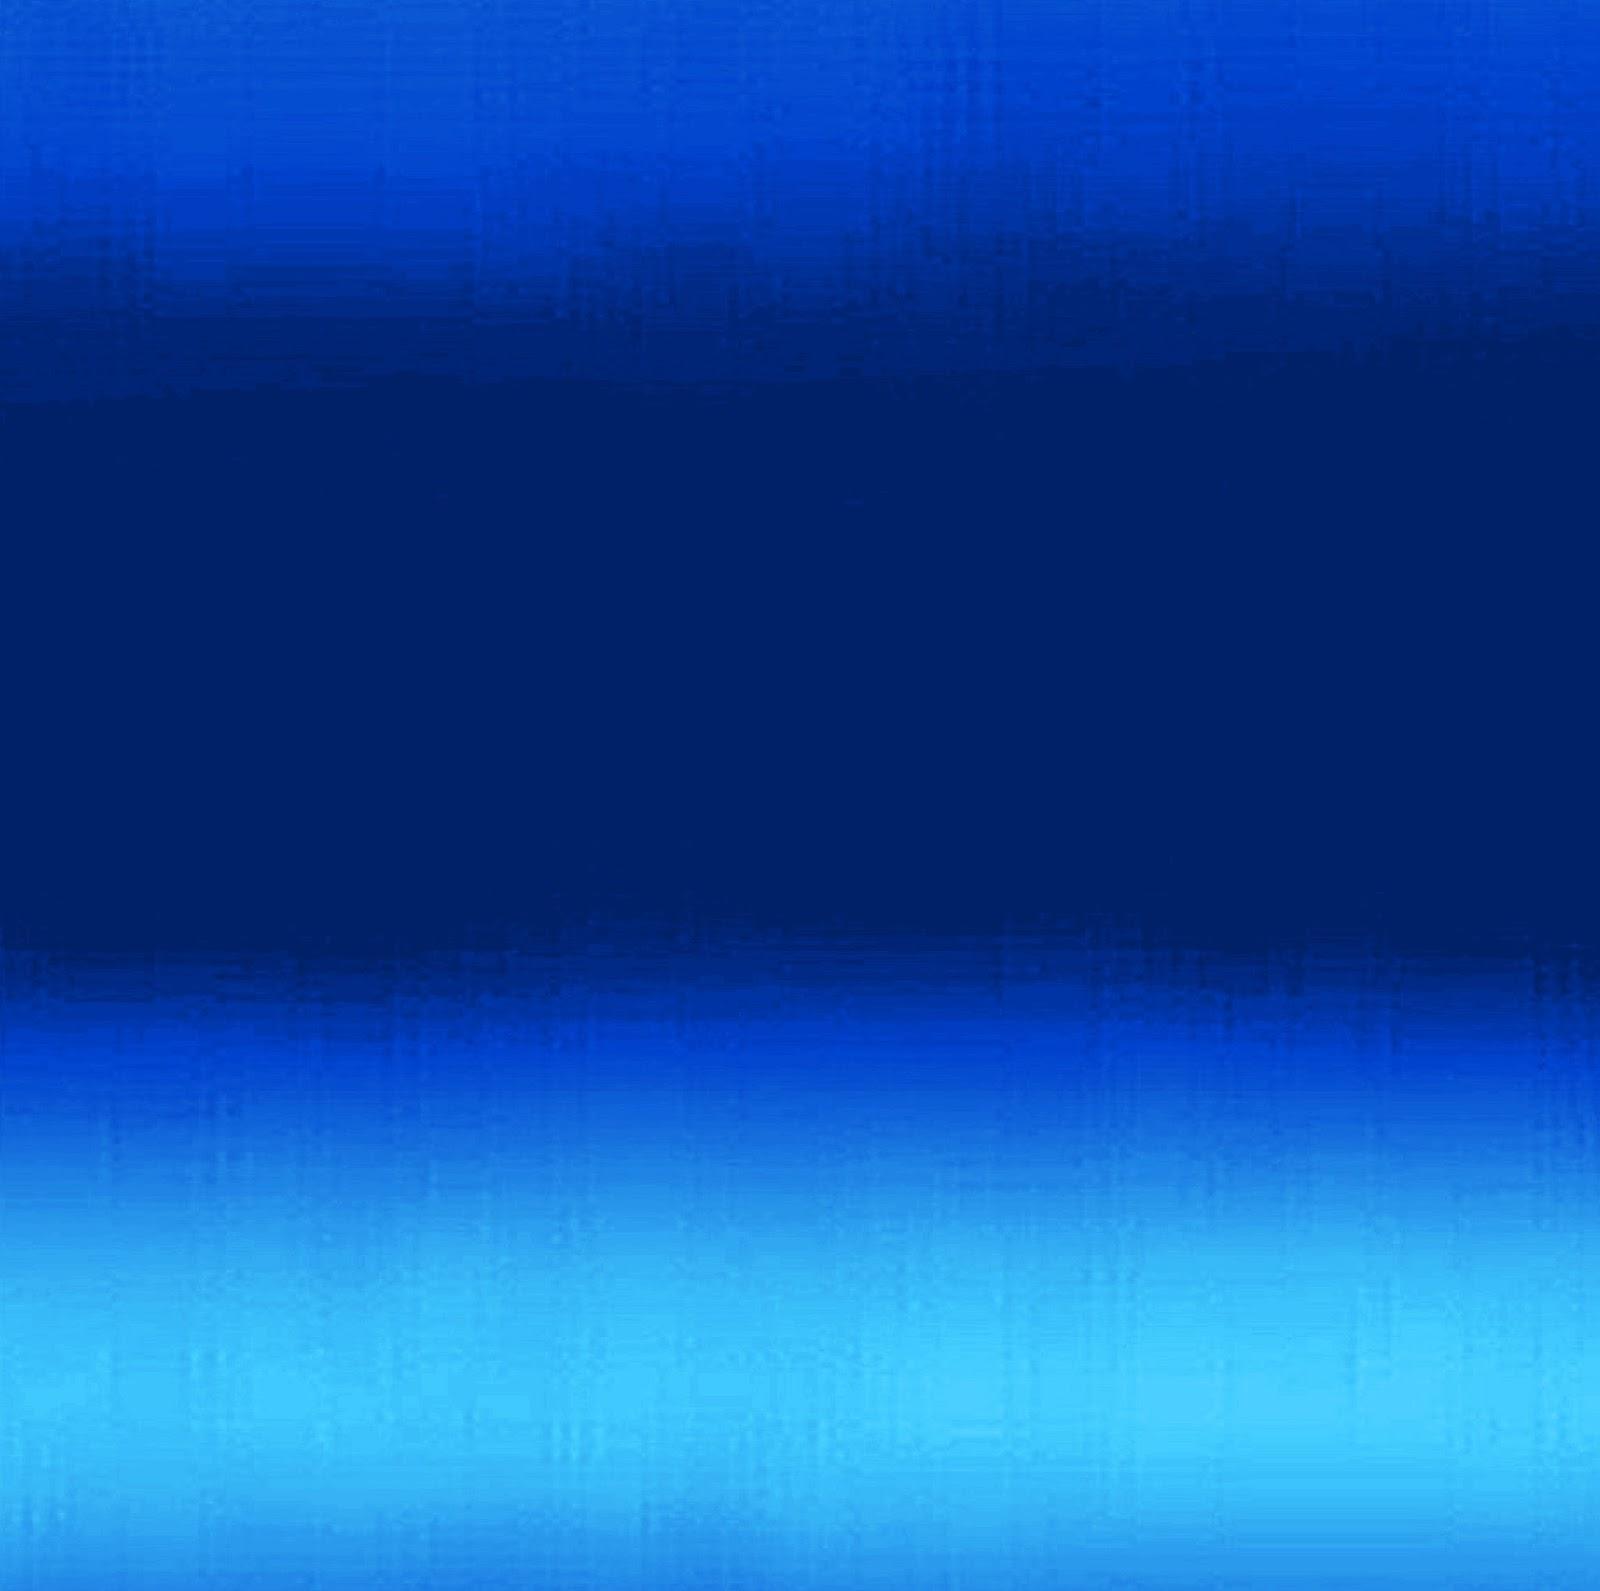 http://esto.imagekind.com